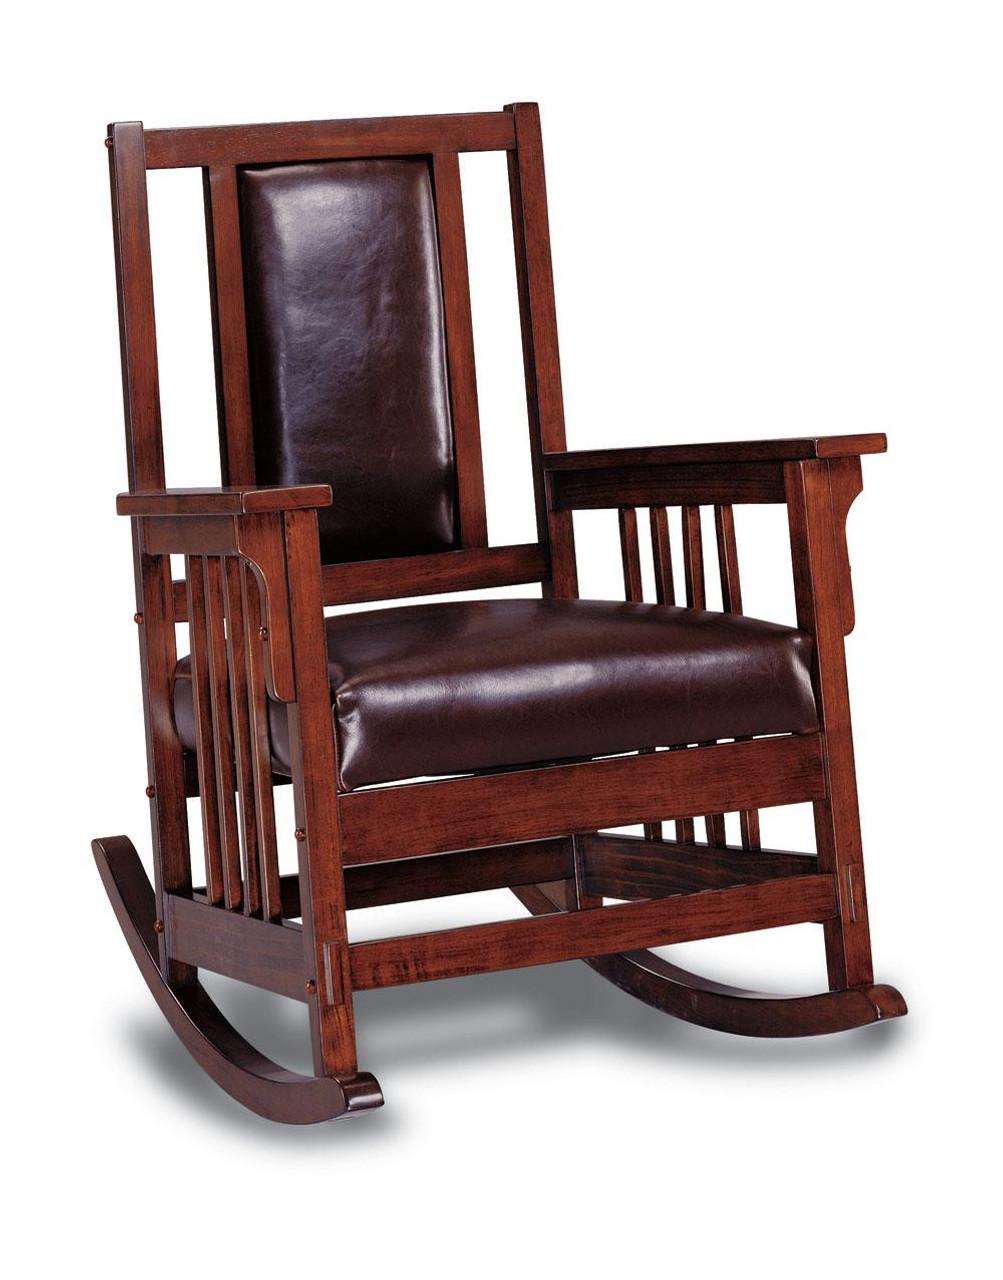 Incredible El Dorado Upholstered Rocking Chair Dailytribune Chair Design For Home Dailytribuneorg